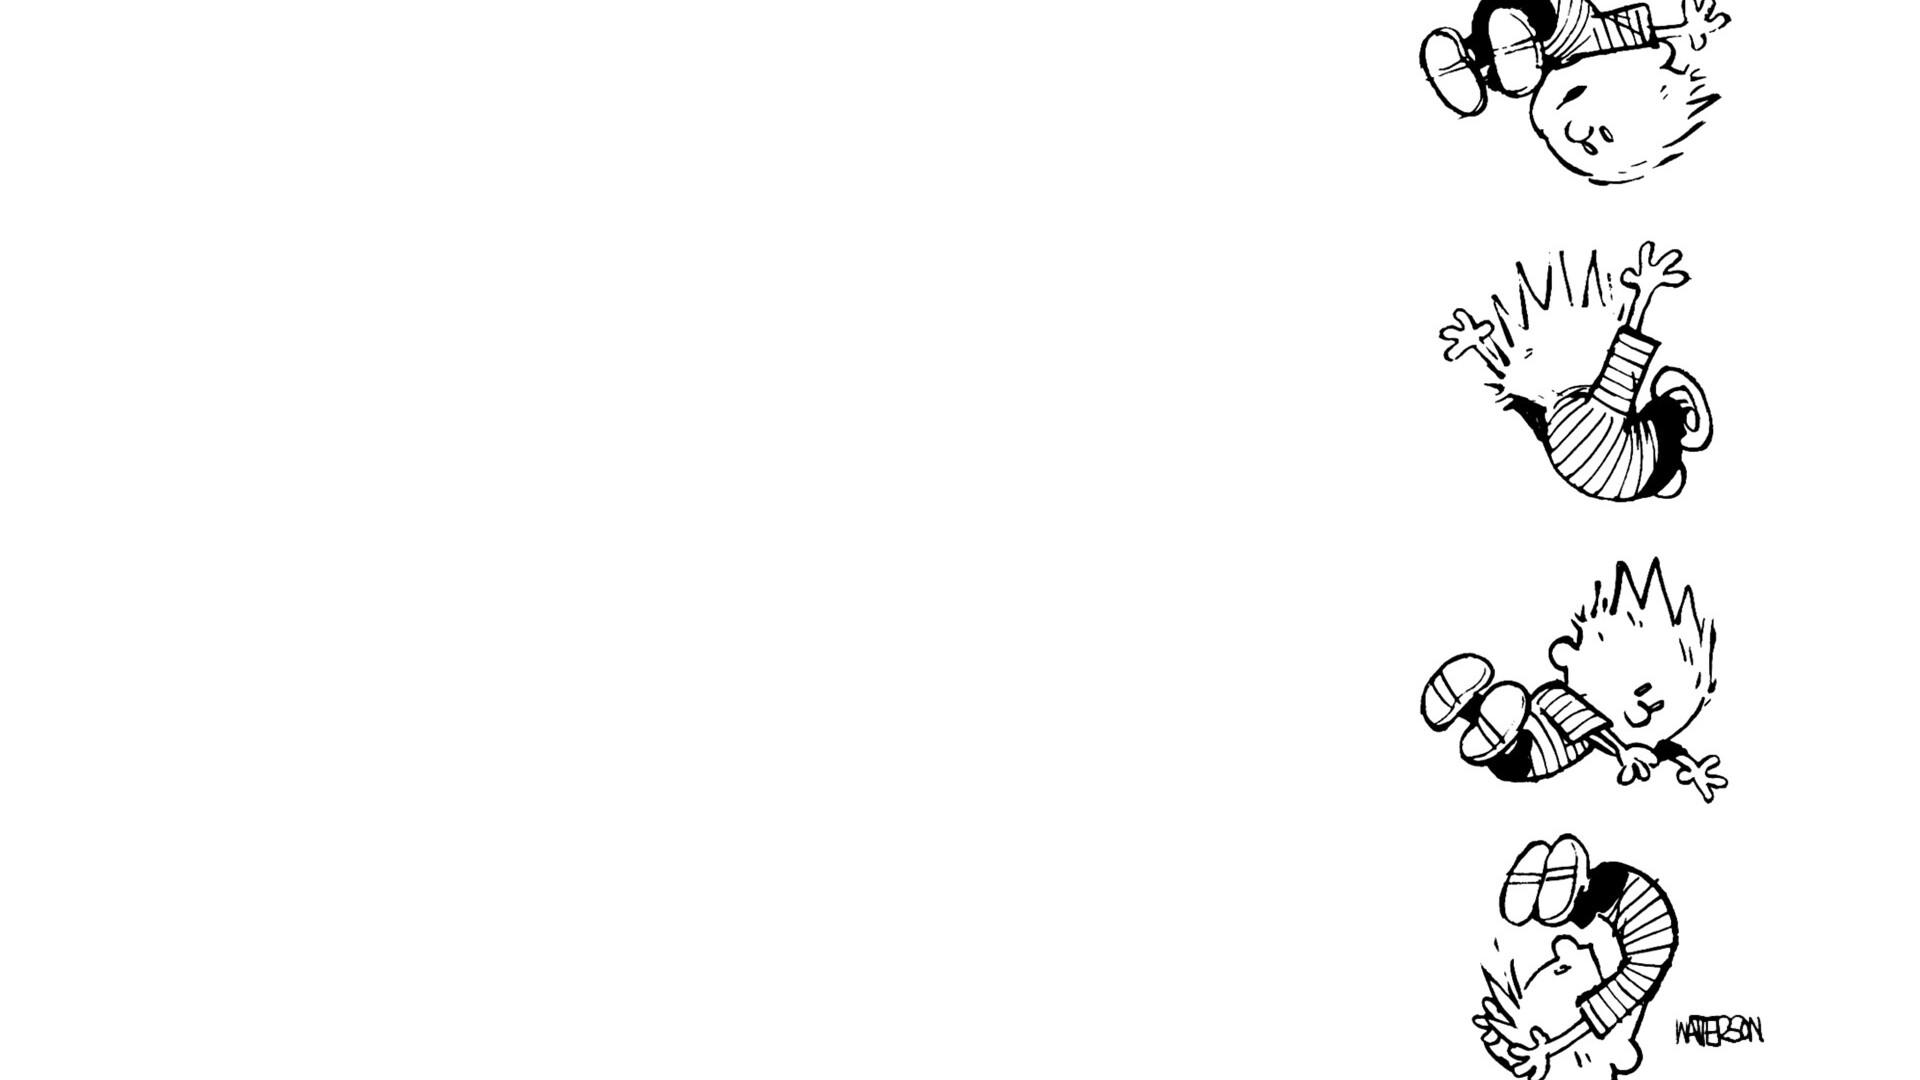 1920x1080 Calvin And Hobbes Laptop Full Hd 1080p Hd 4k Wallpapers